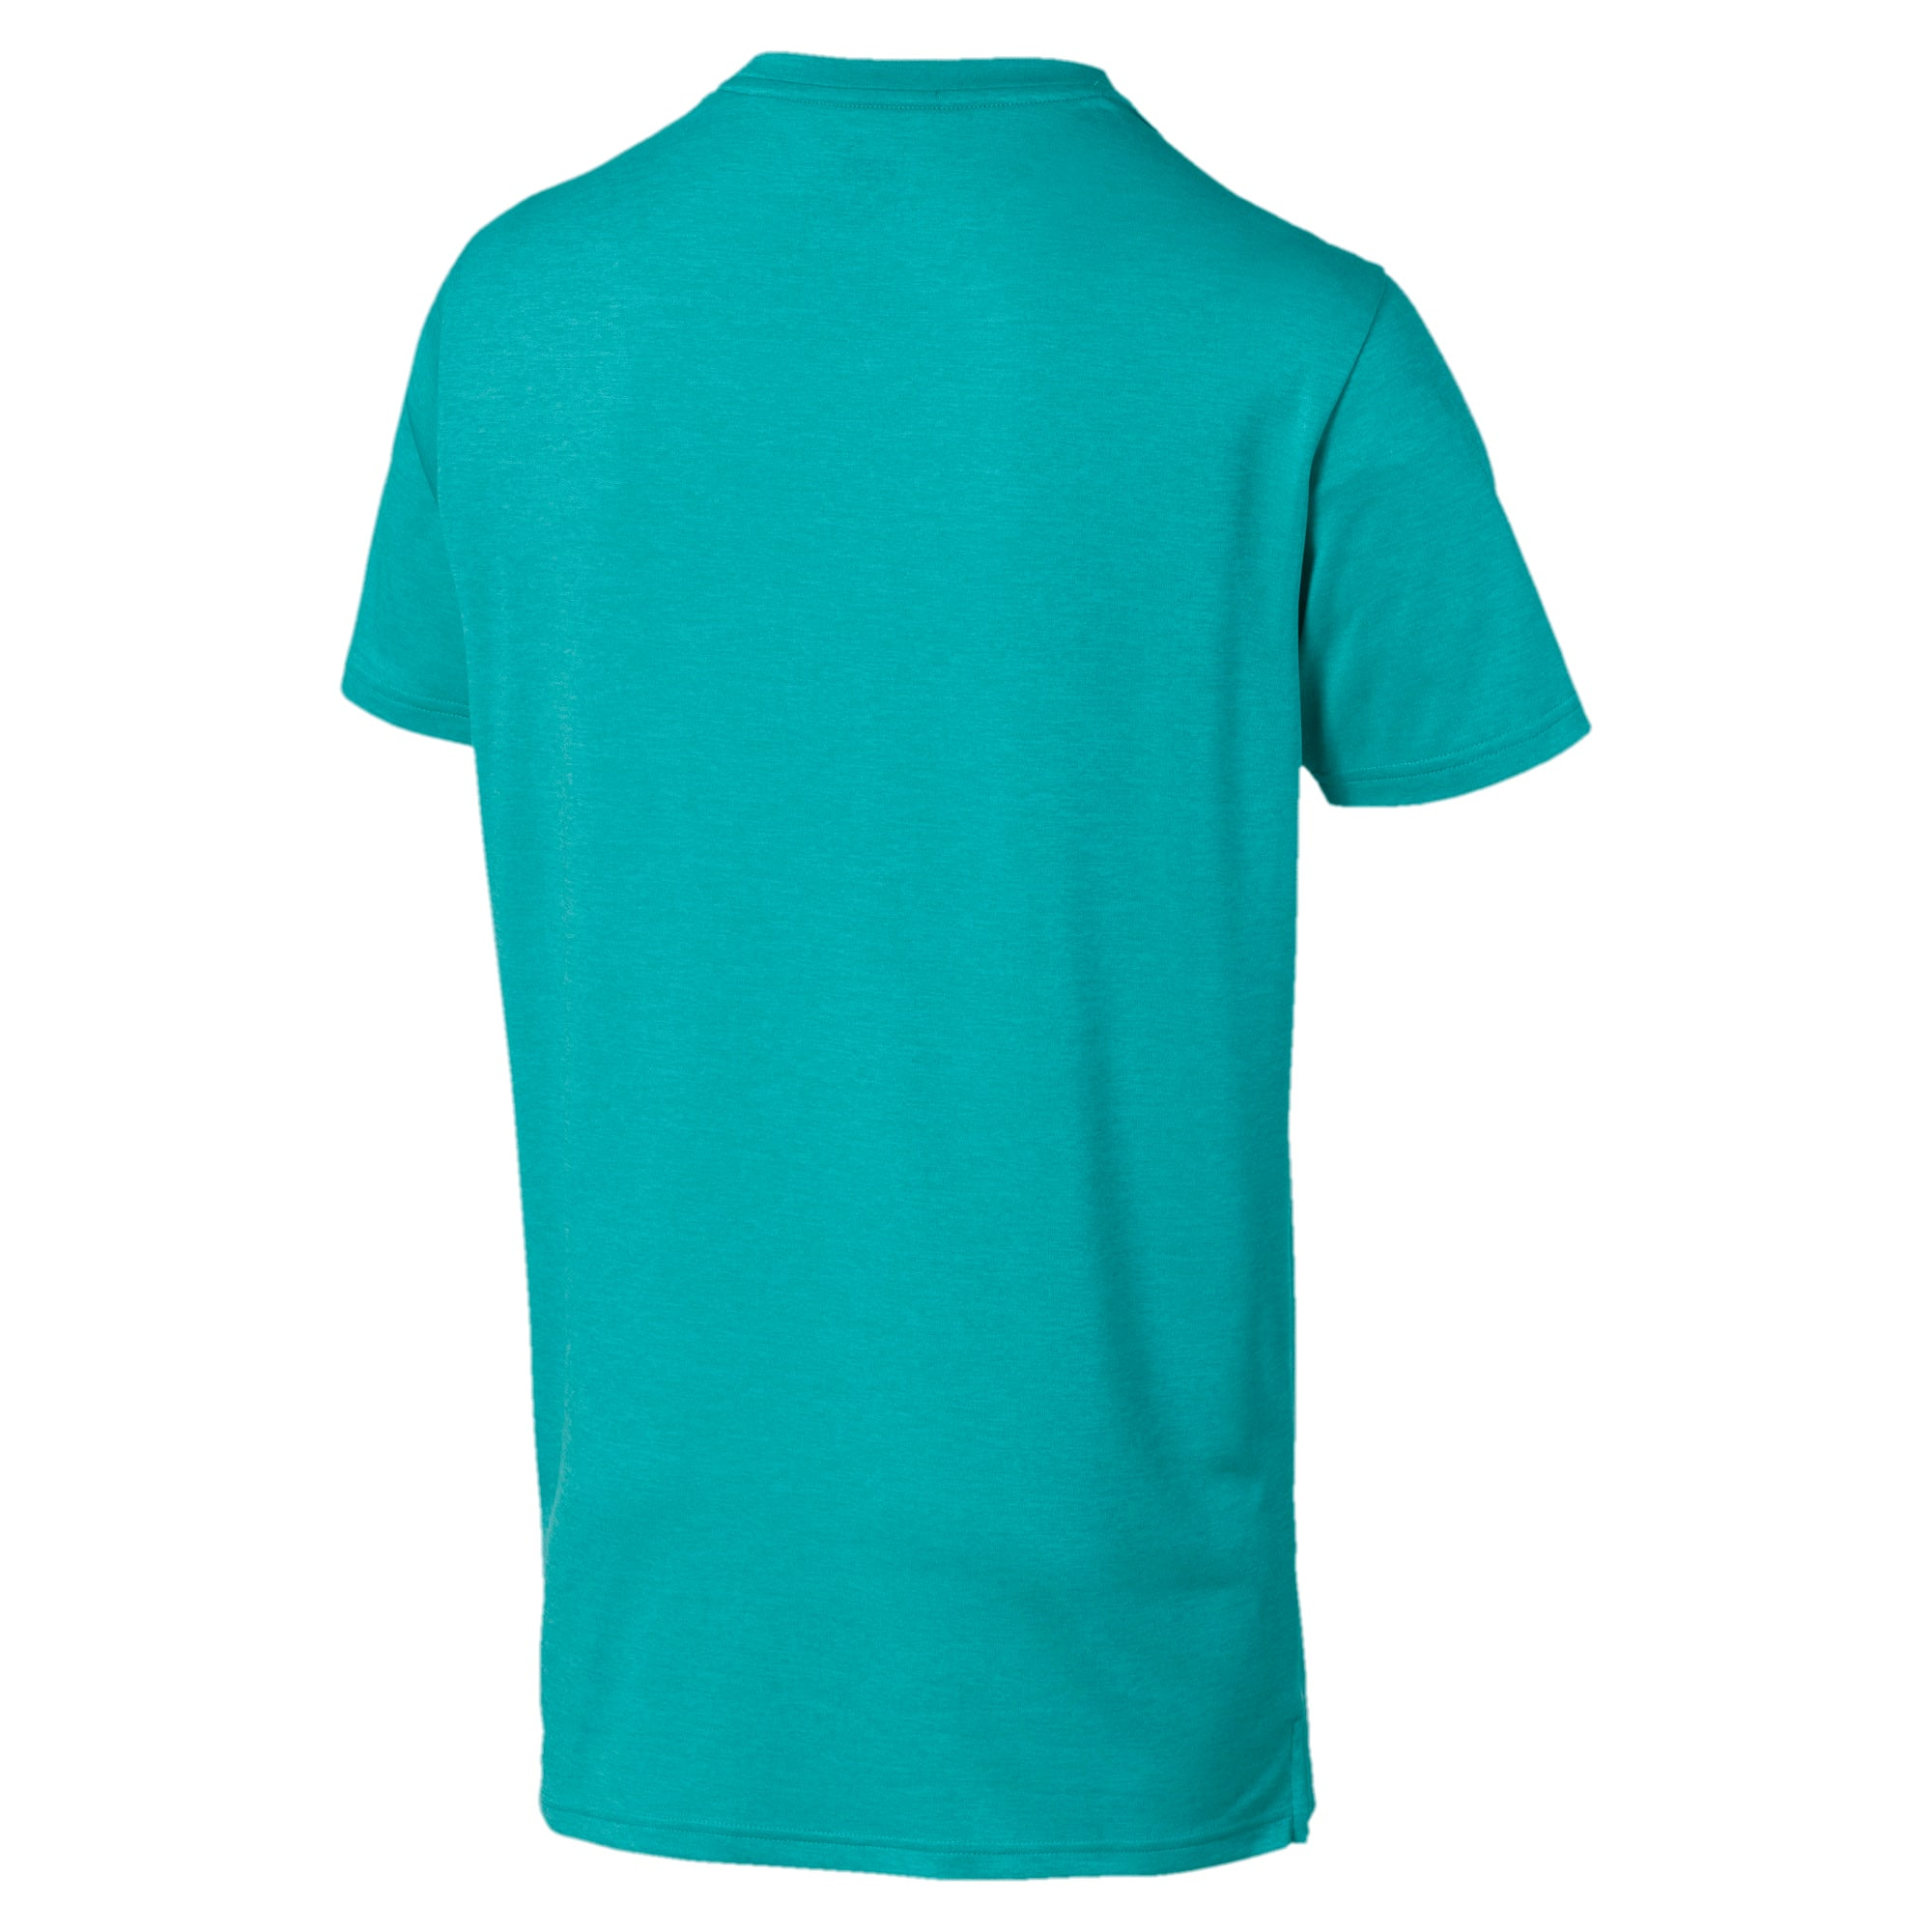 Thumbnail 5 of Heather Cat Herren Training T-Shirt, Blue Turquoise Heather, medium